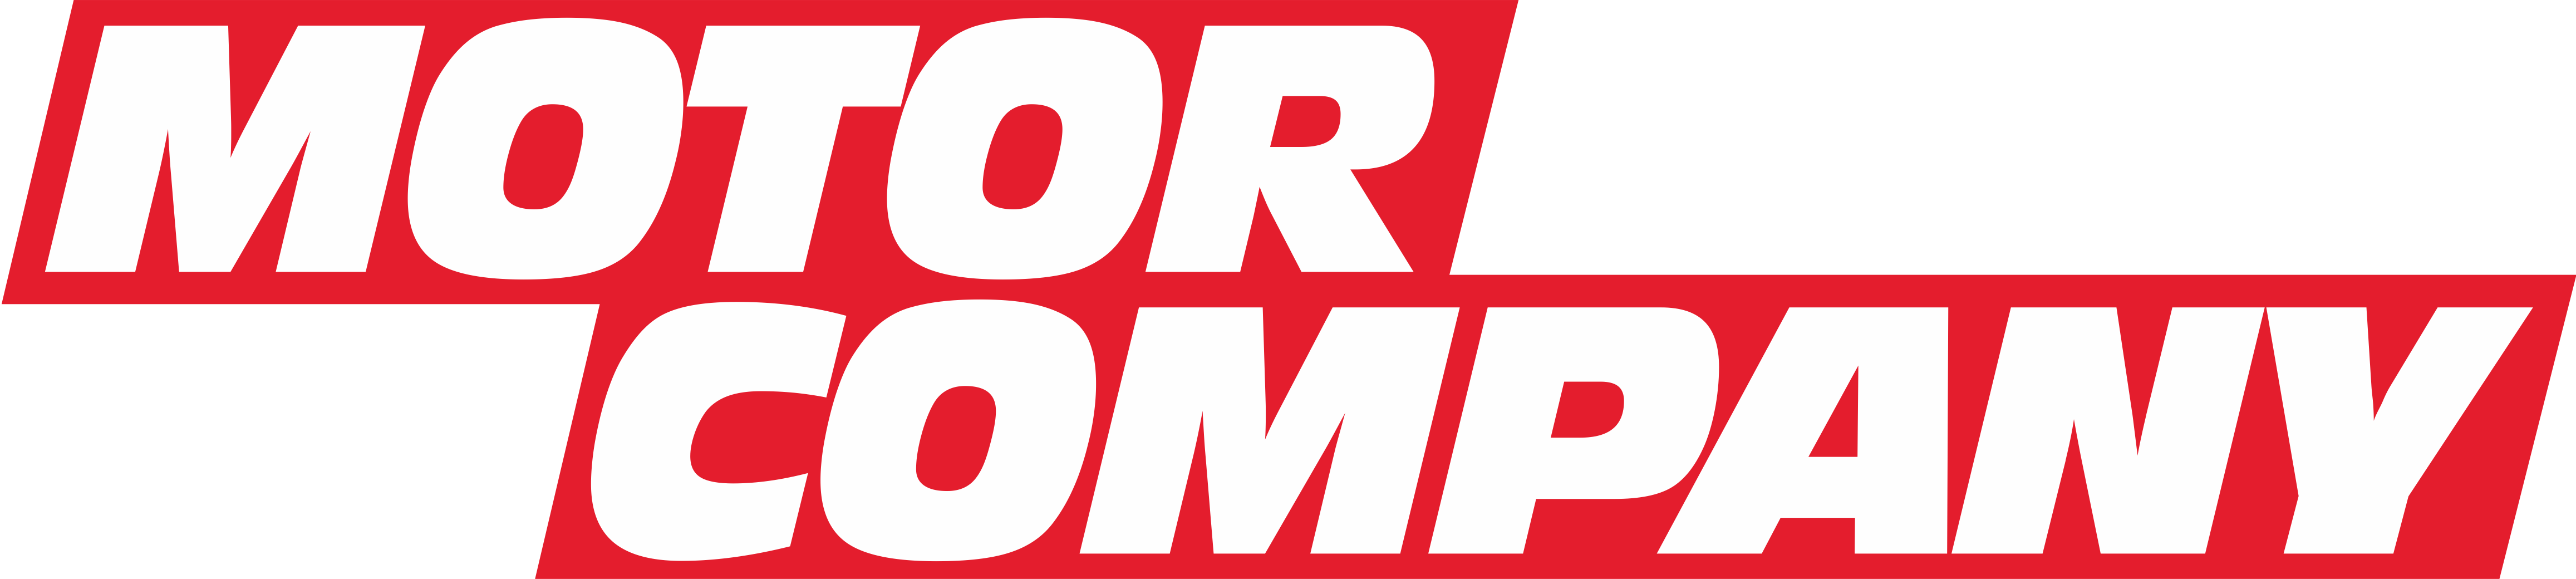 Sponsorenbild von Motor Company